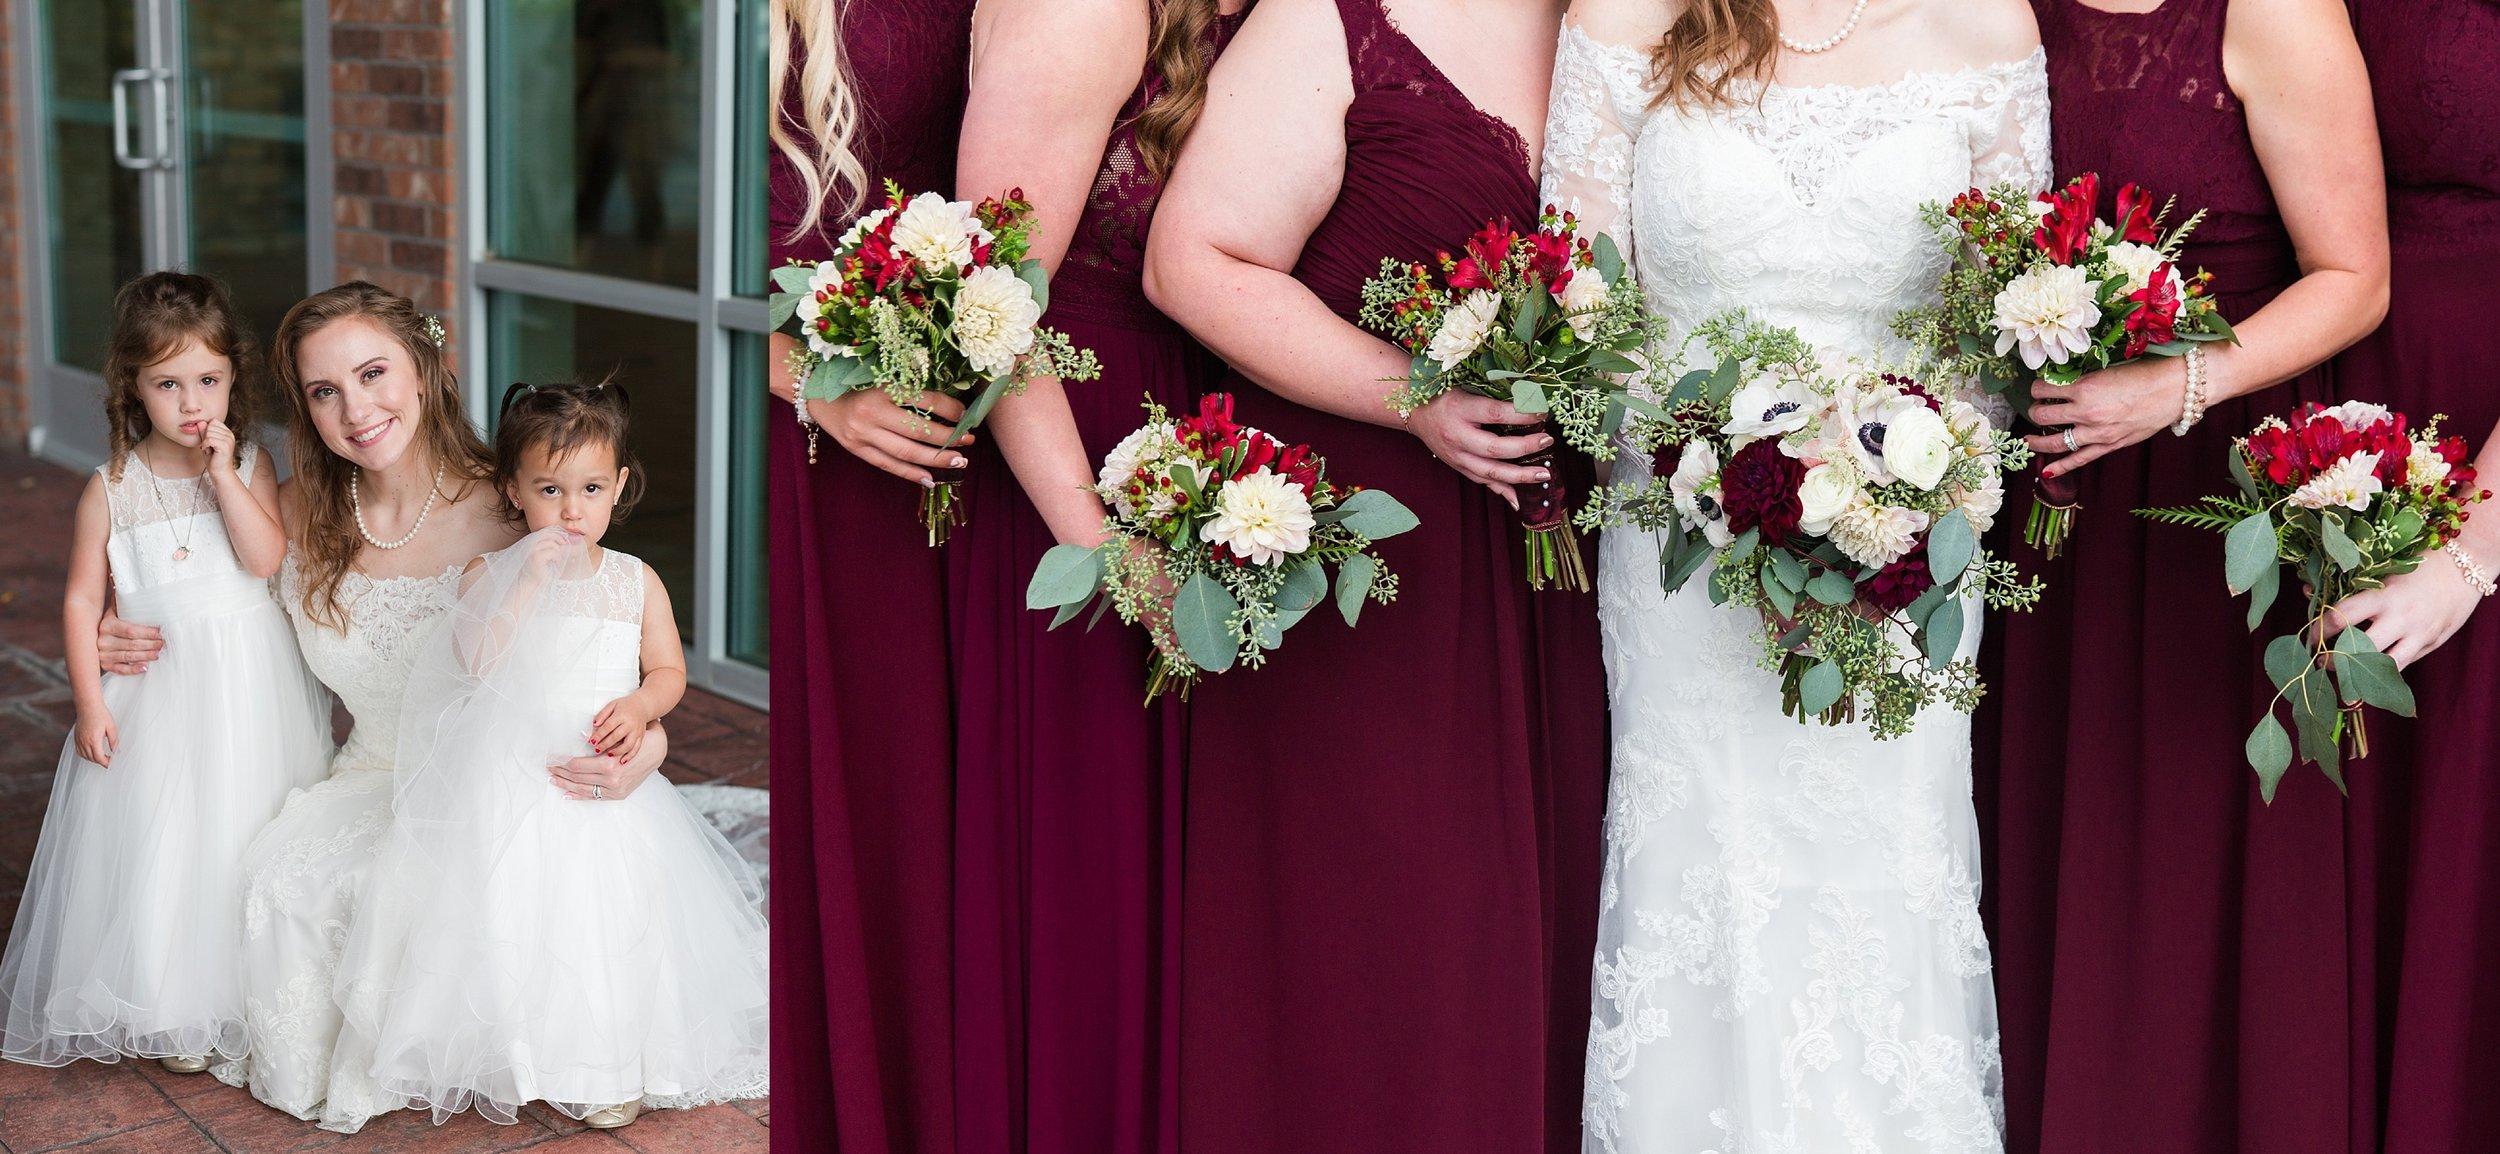 Oklahoma City Wedding Photographer -Jessica McBroom